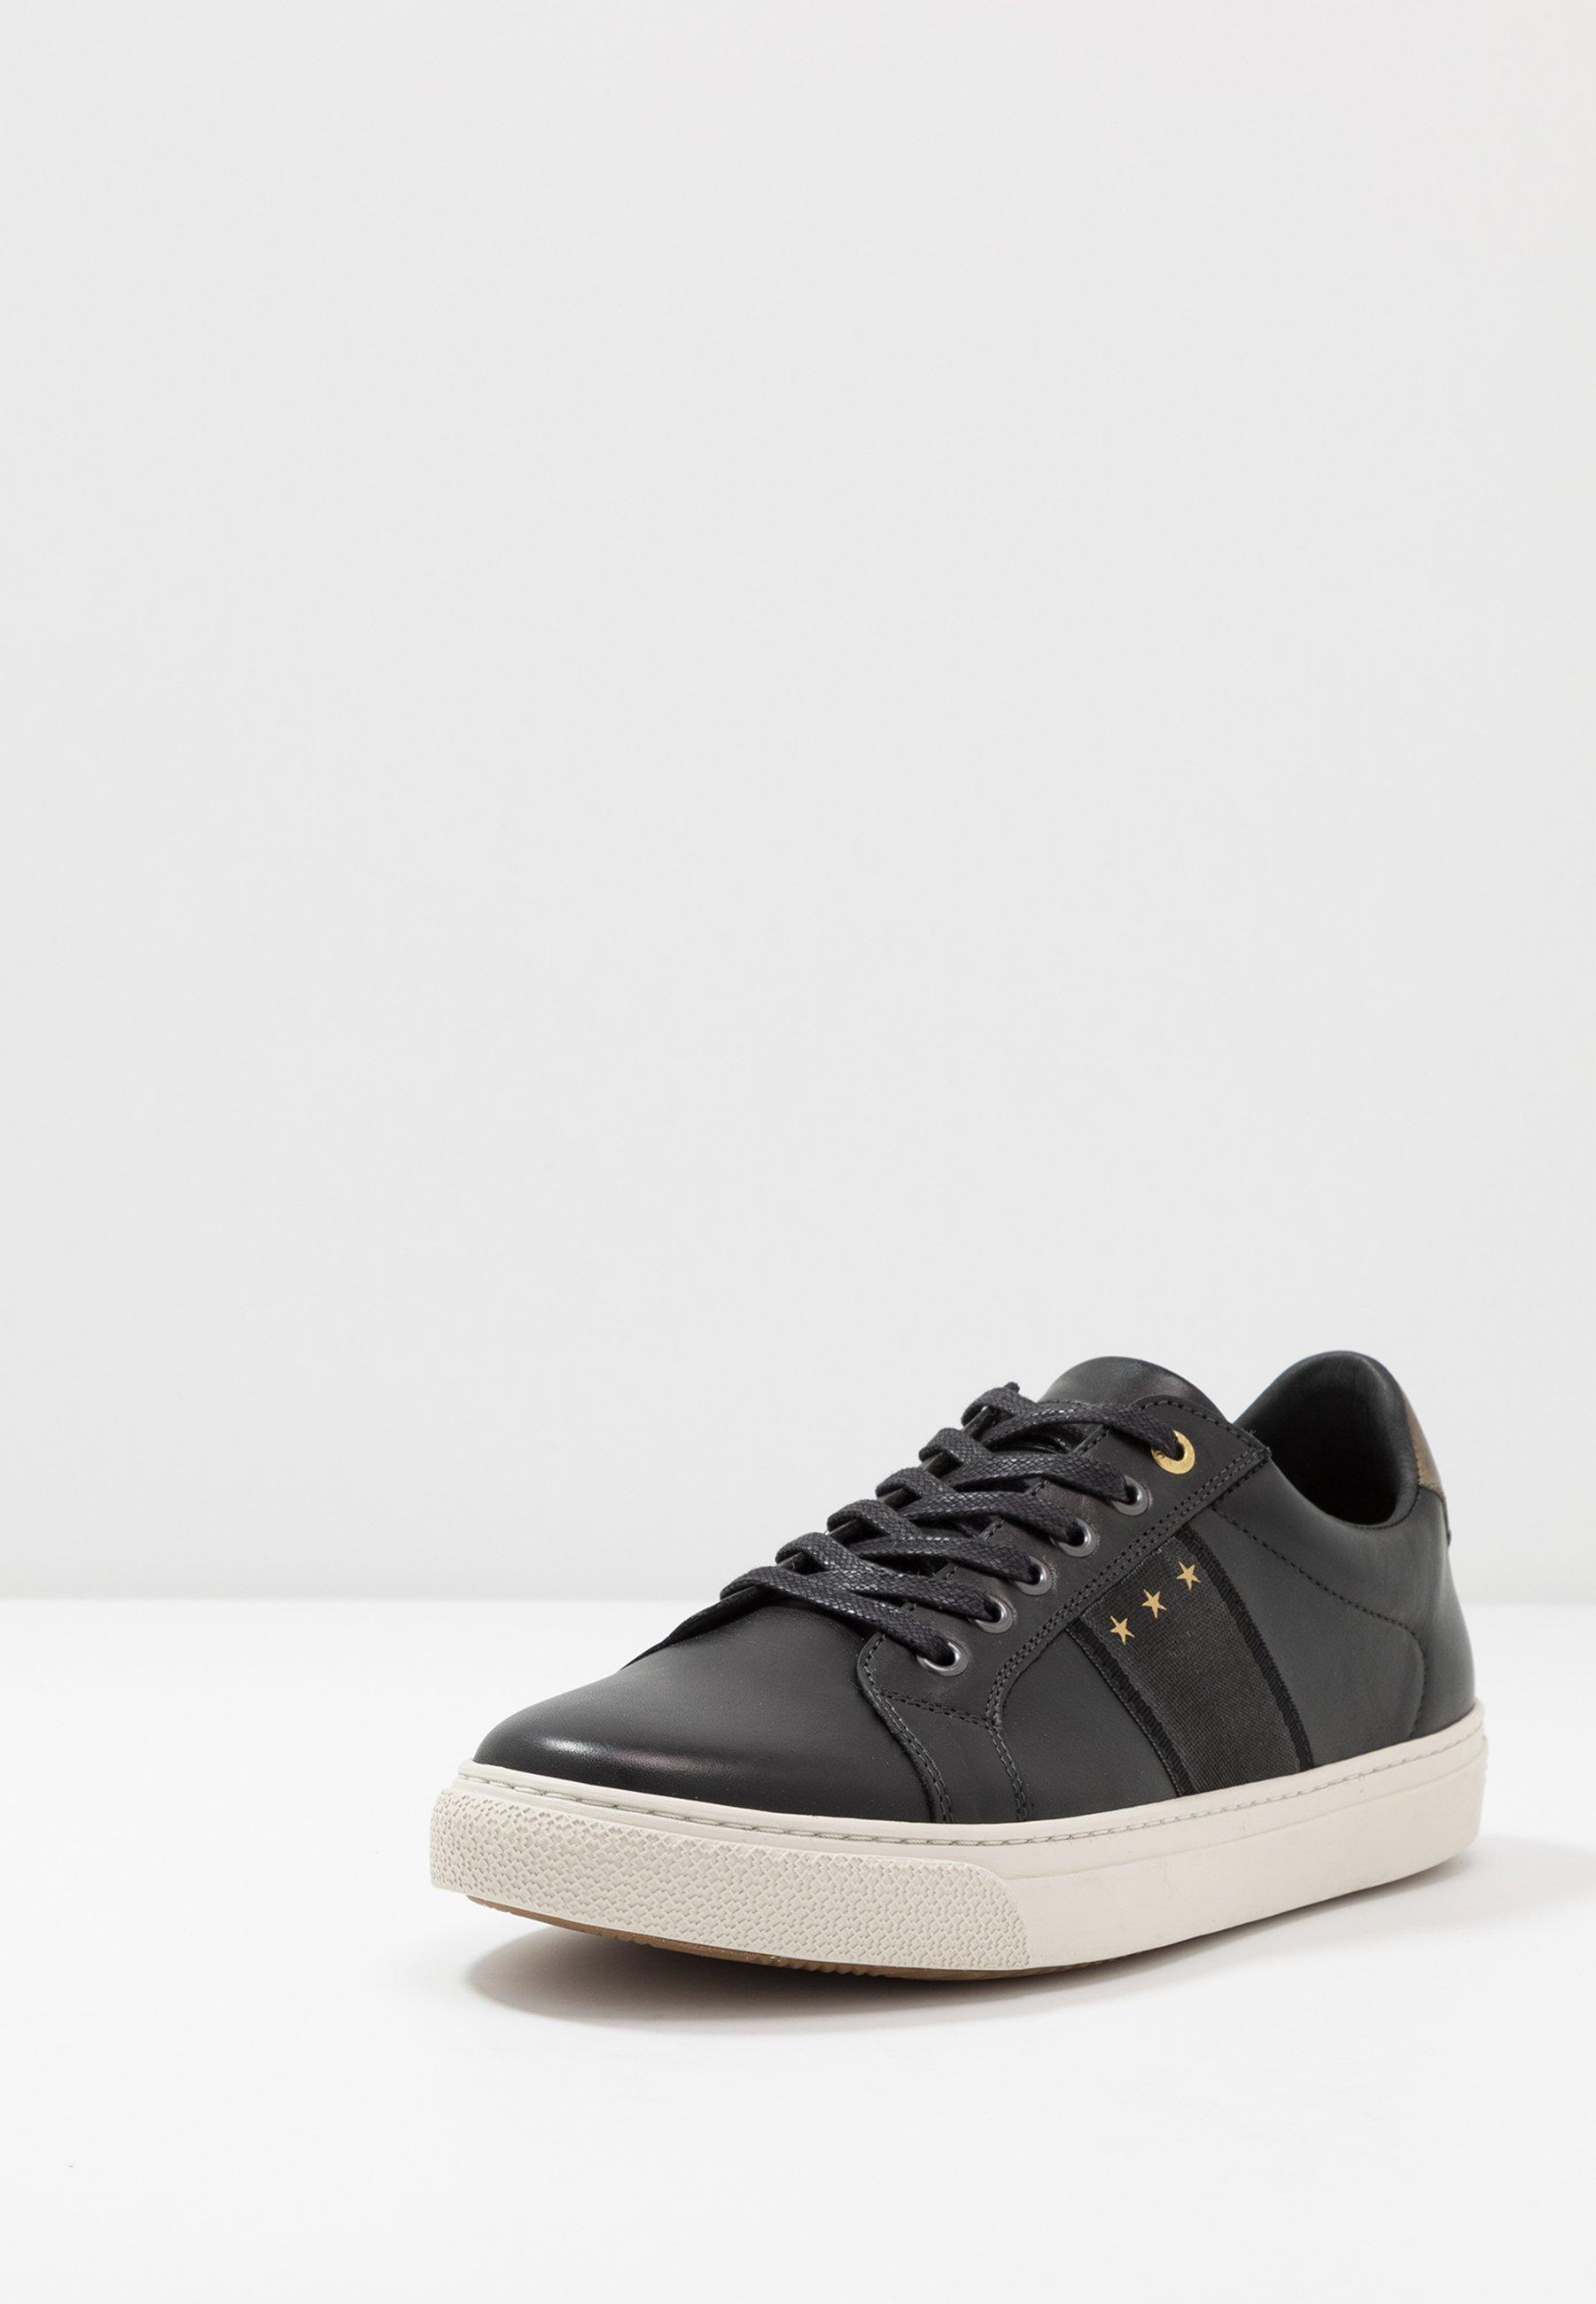 Pantofola dOro NAPOLI UOMO - Sneaker low - black/schwarz - Herrenschuhe ltEds